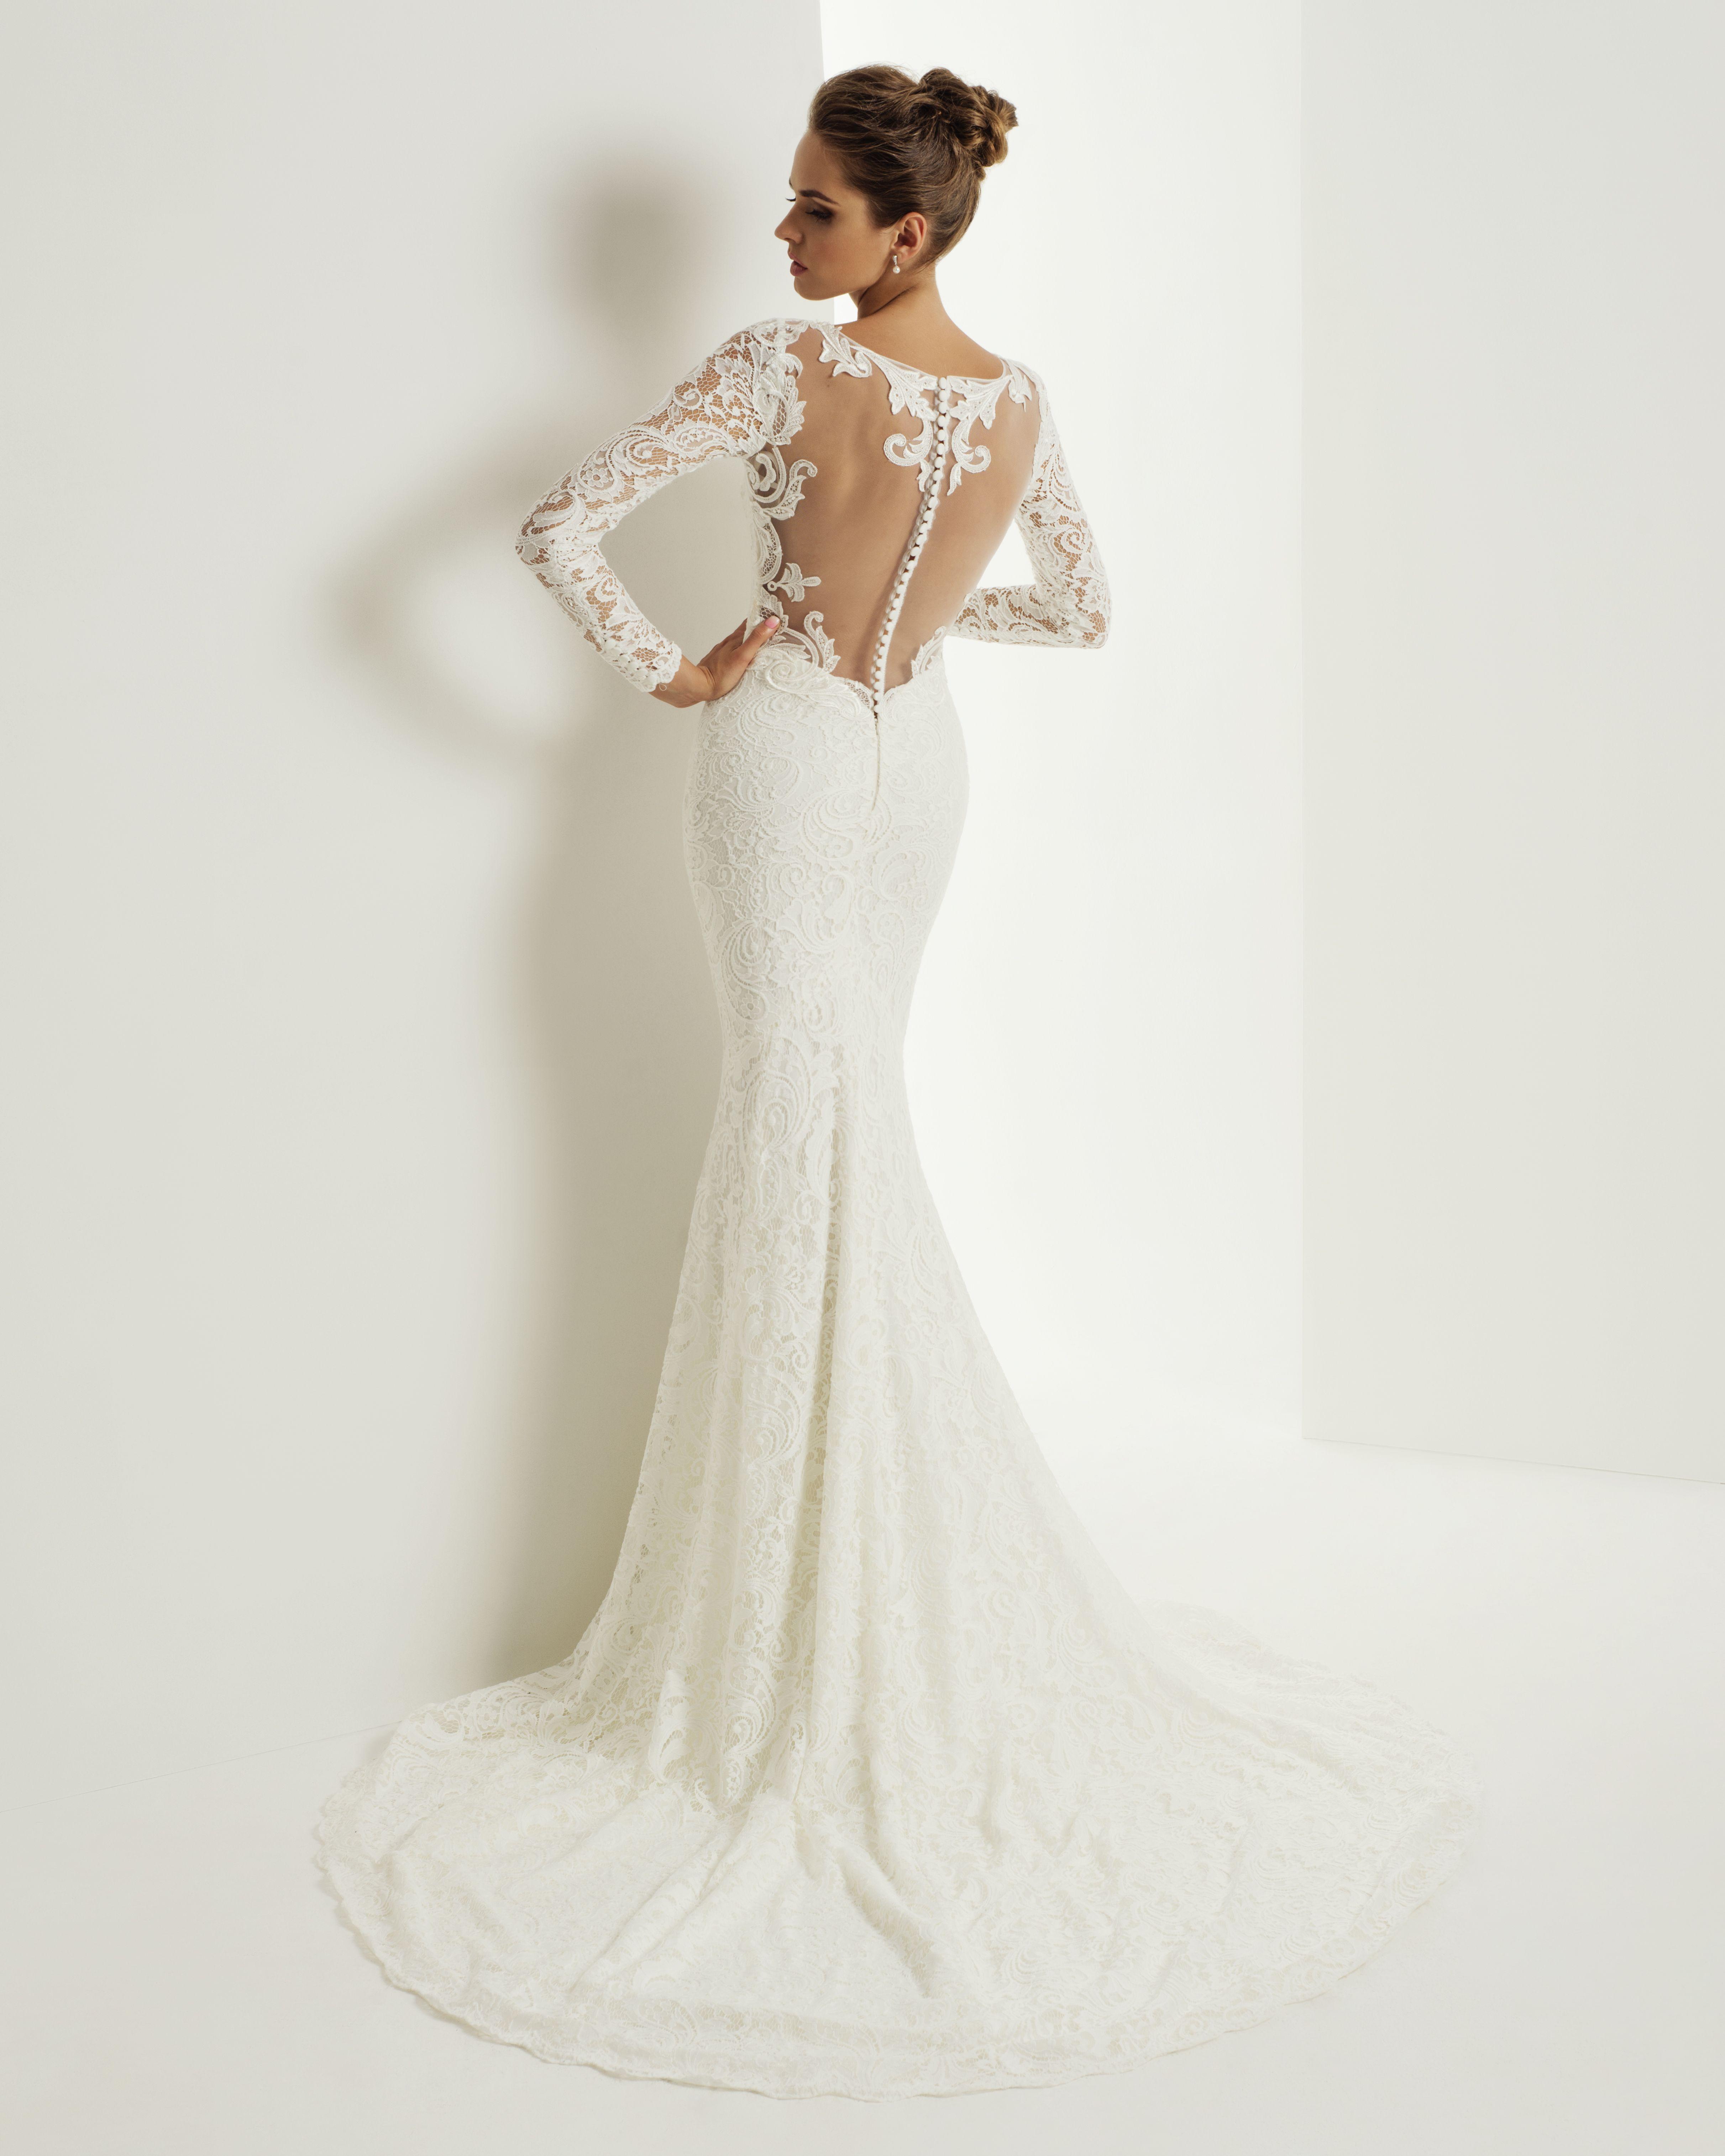 8bbf961eea1 Robe de mariée Cecilia de style tulipe toute en dentelle. Ellegant  wedding   gown with lace sleeves at Bridal boutique Natalia Exclusif in Montreal.